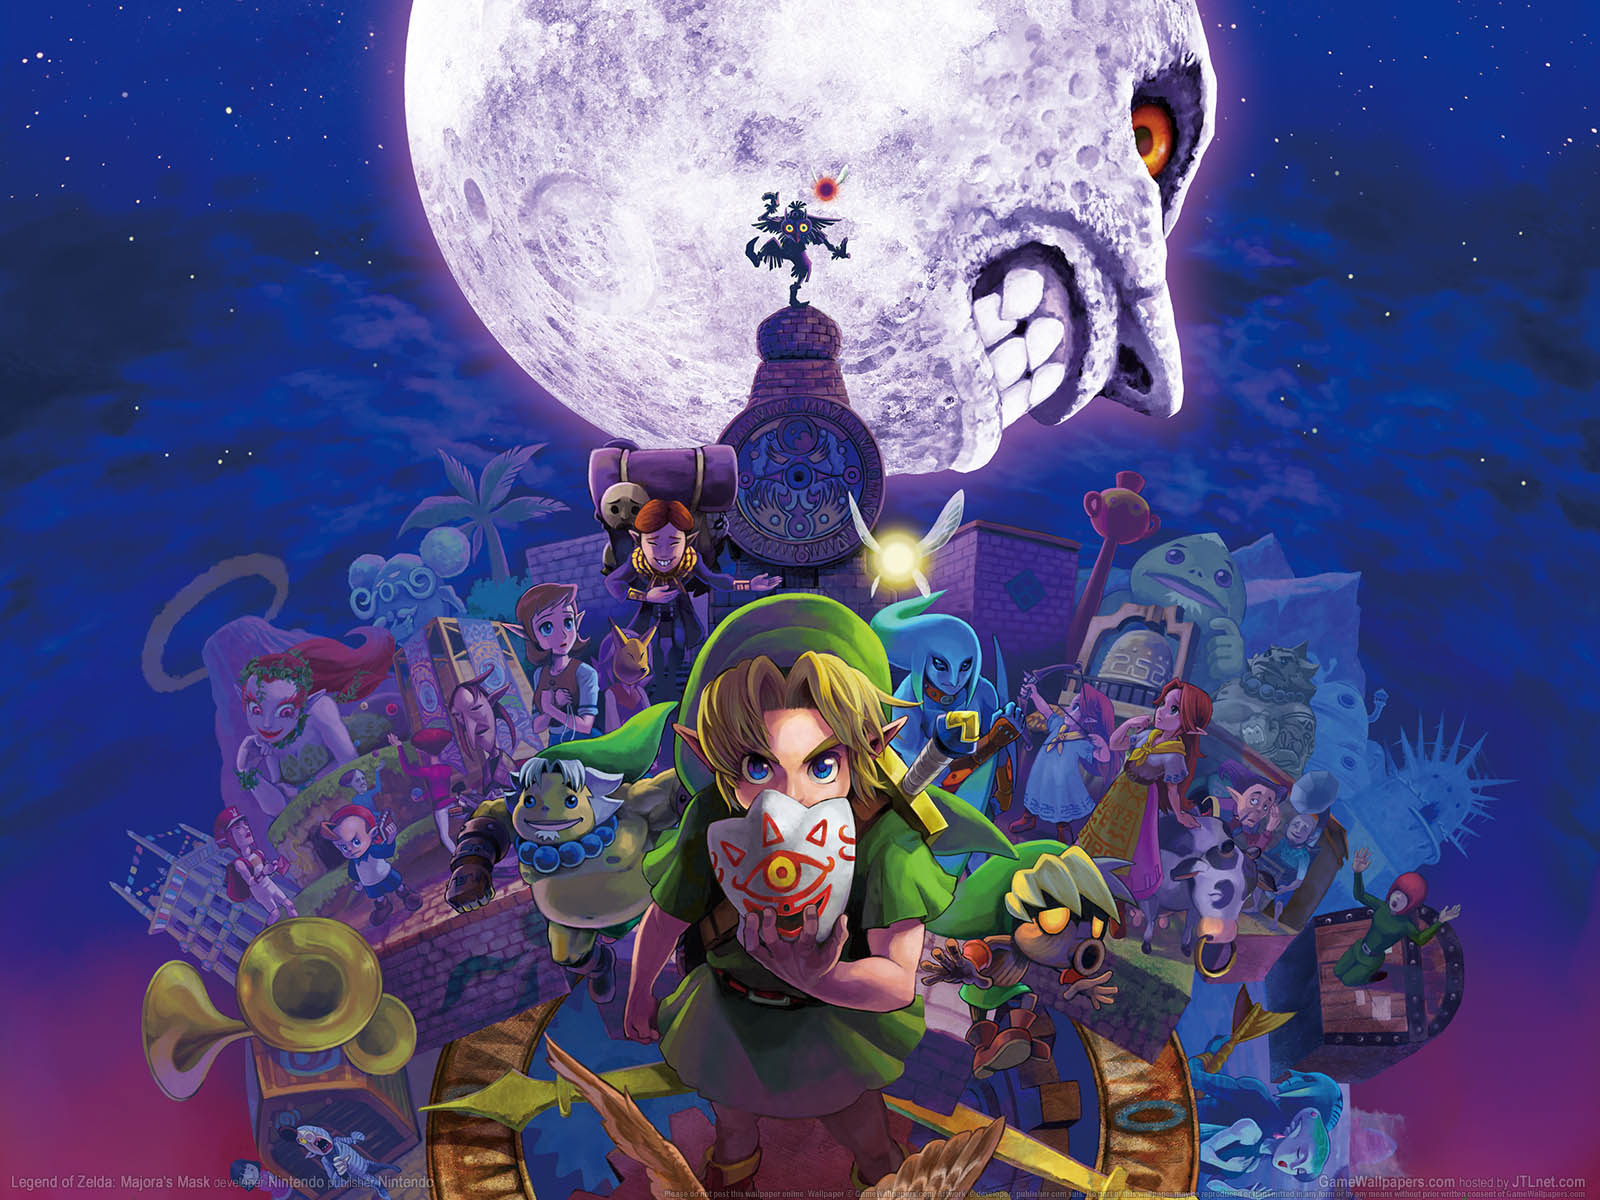 Legend of Zelda: Majora's Maskνmmer=01 achtergrond  1600x1200